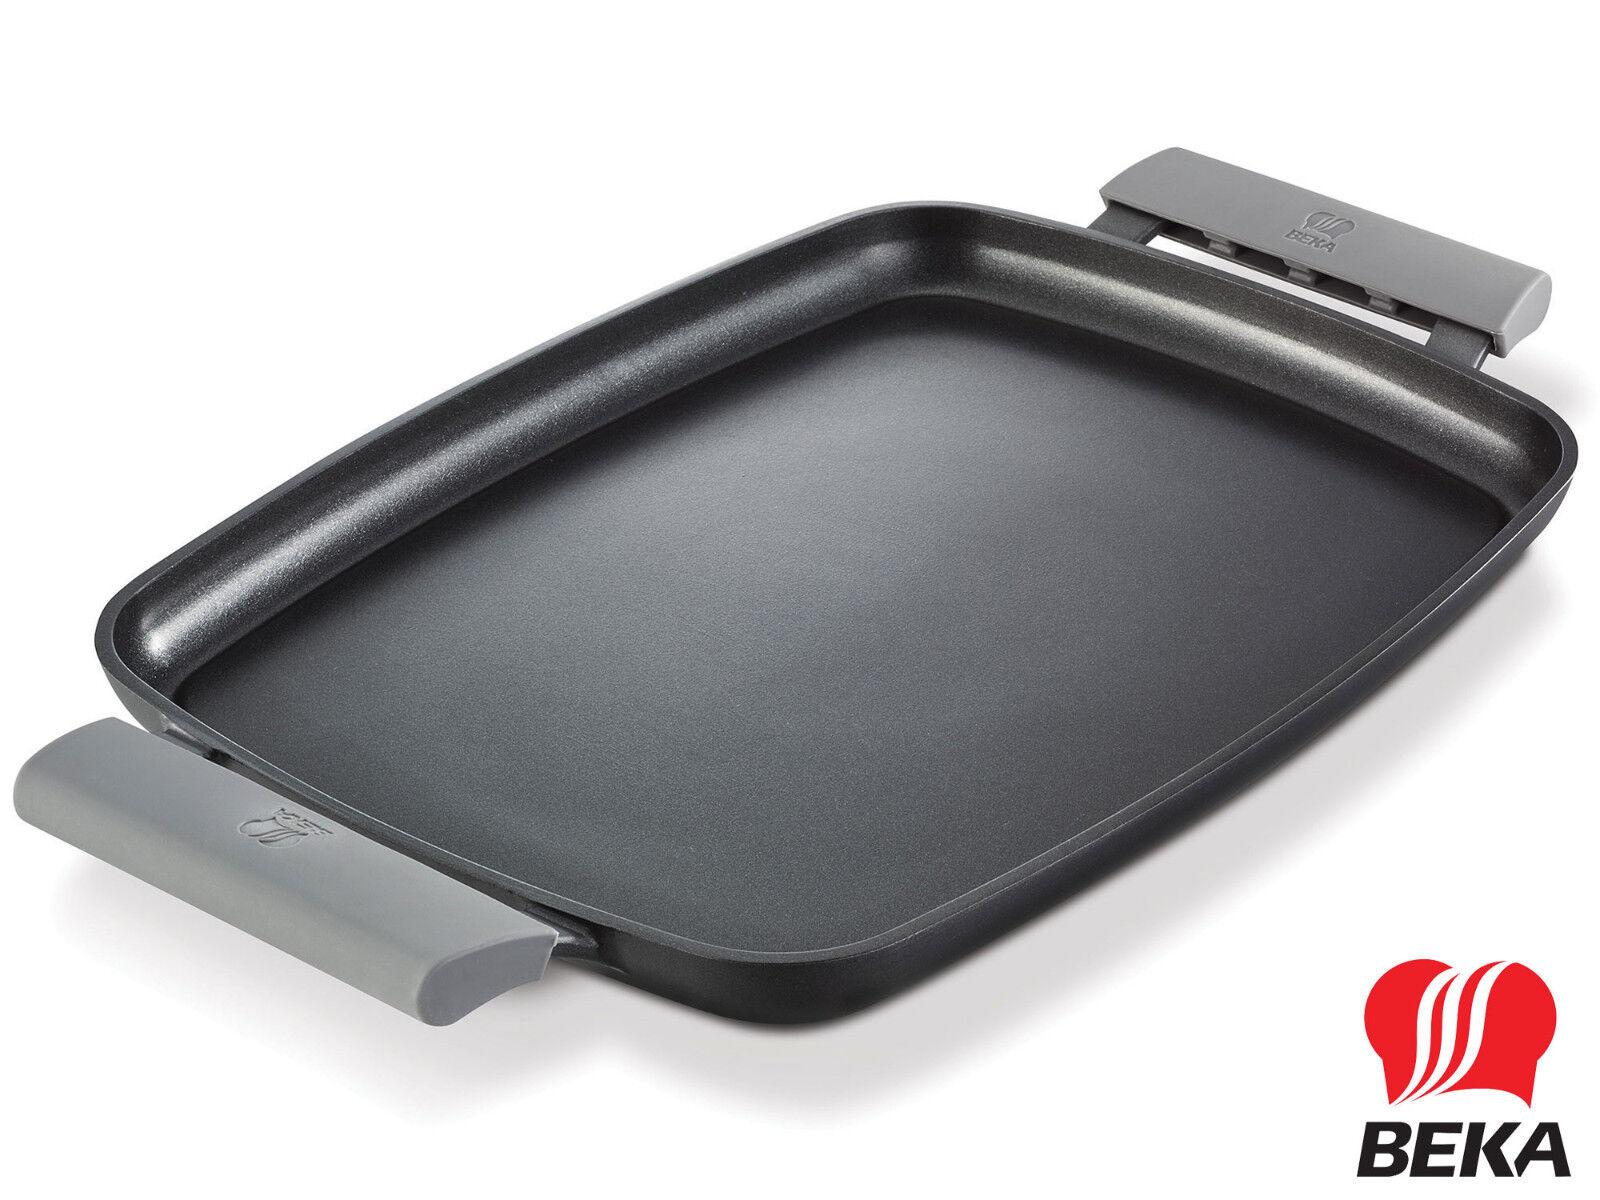 BEKA Aluguss Teppanyaki Grillplatte glatt 47 cm Vollflächen-Induktion